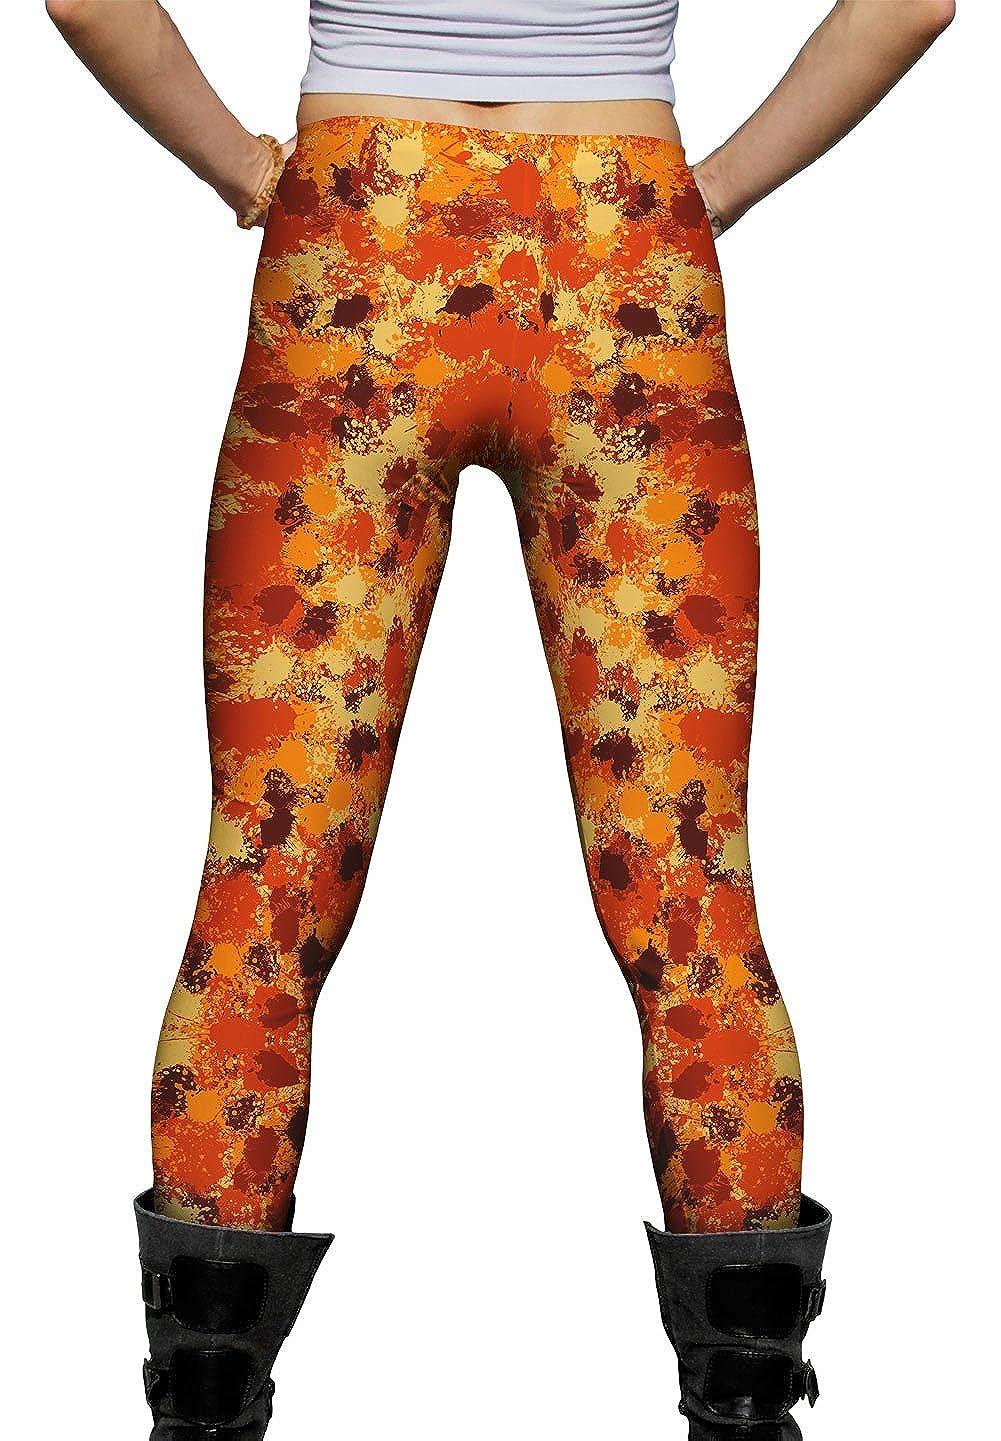 Ladies Womens Leggings Yizzam Paint Splatter Madness Orange